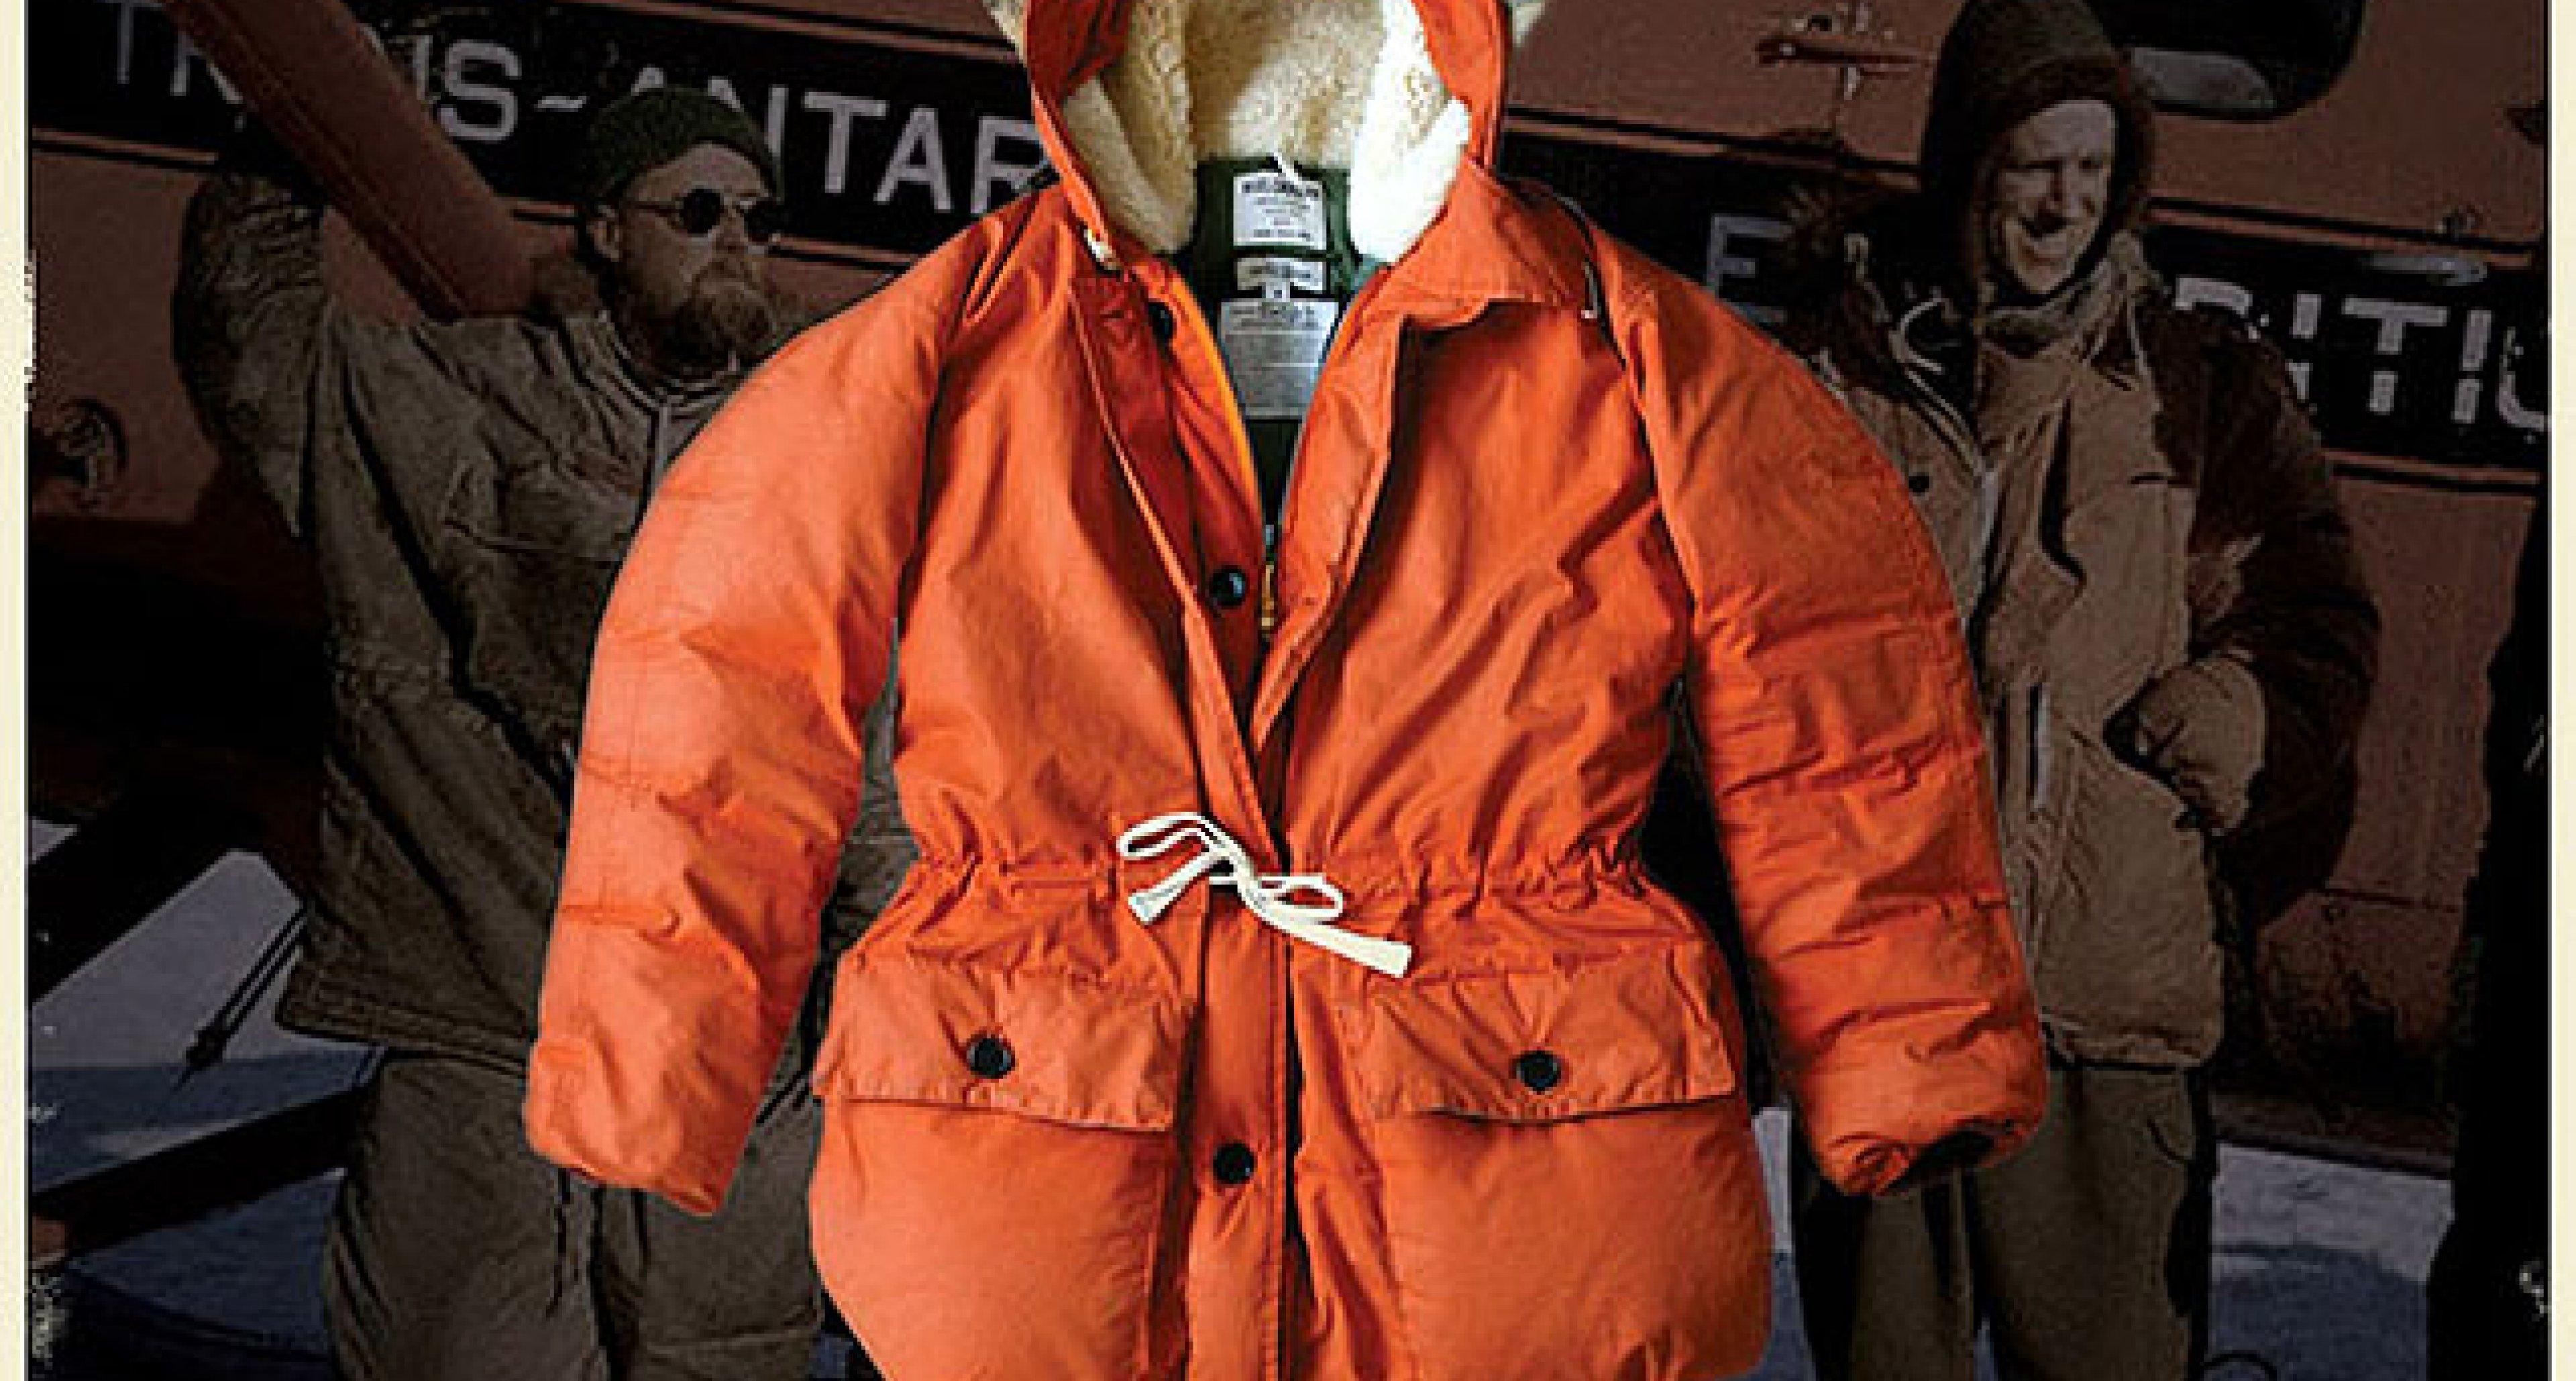 Nigel cabourn orange parka